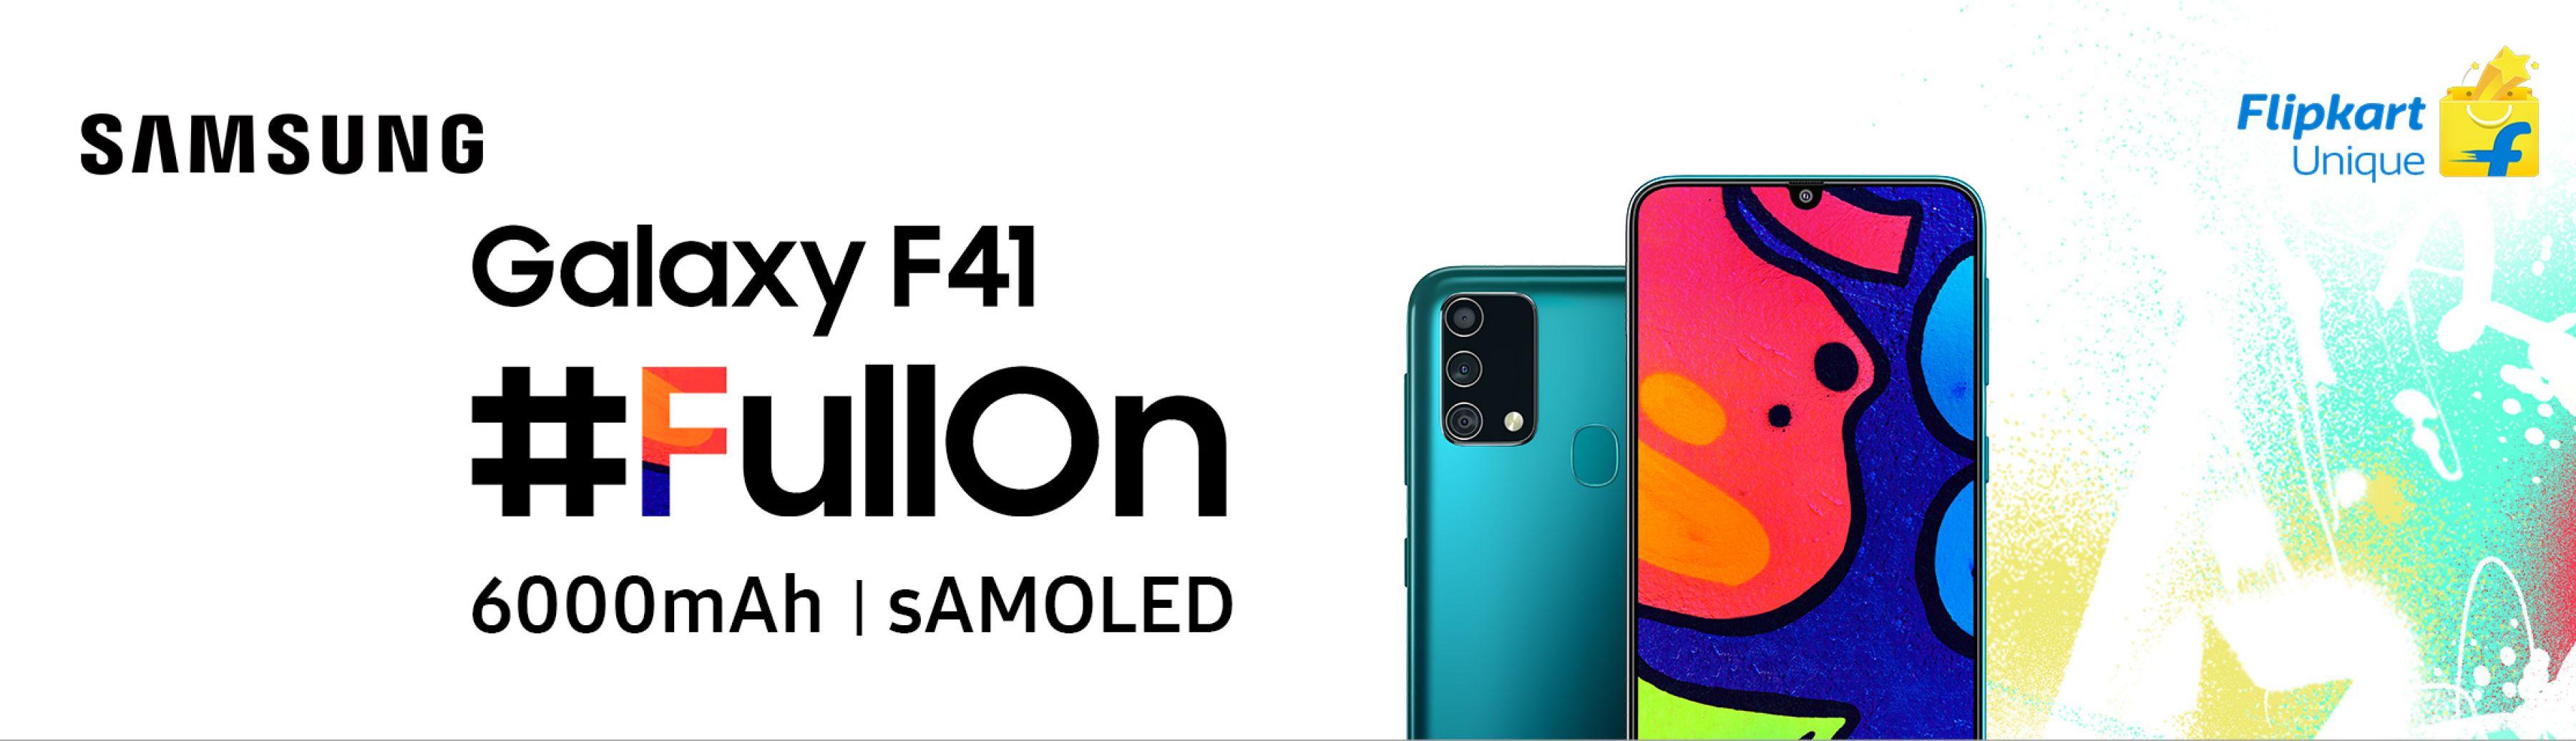 smartfon Samsung Galaxy F41 smartphone teaser